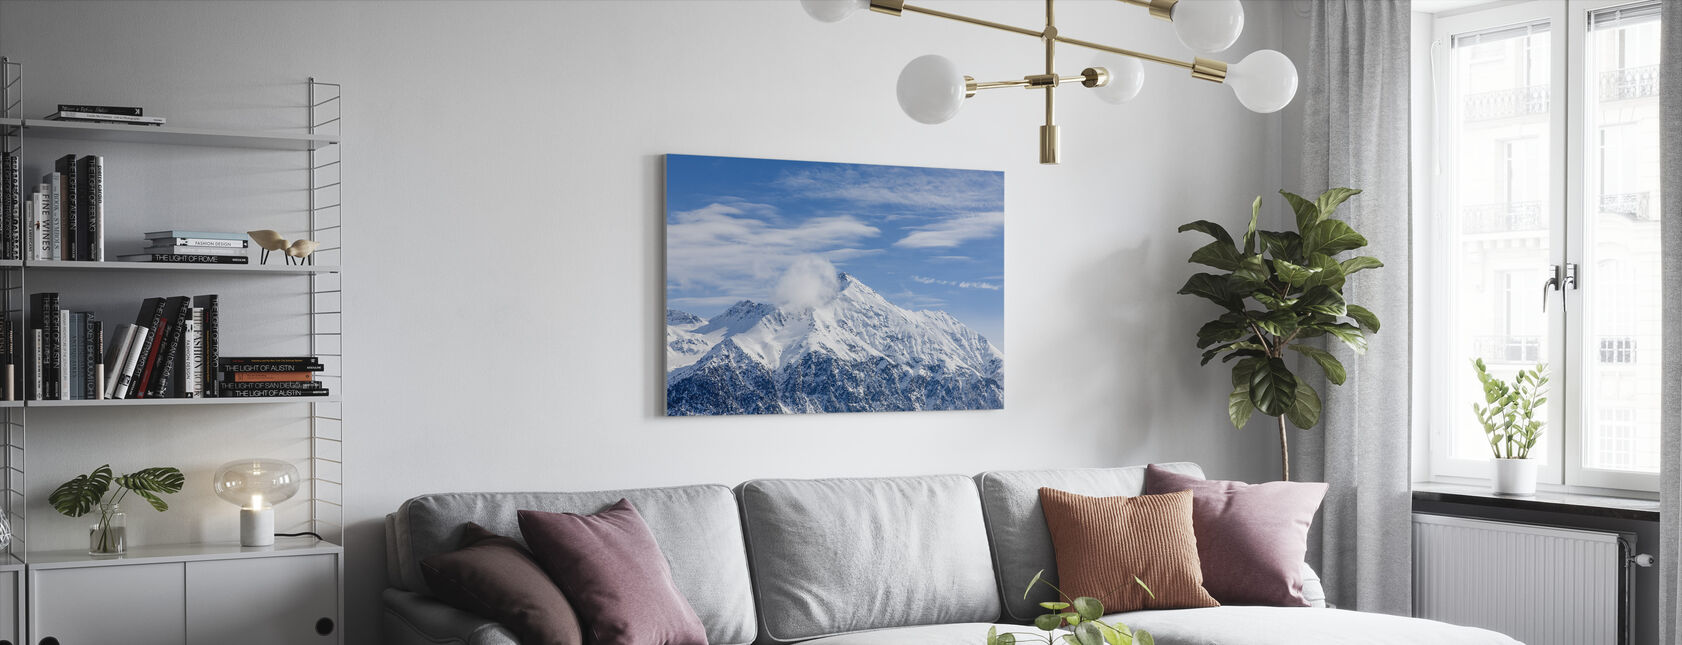 Sveitsiske alpene - Lerretsbilde - Stue